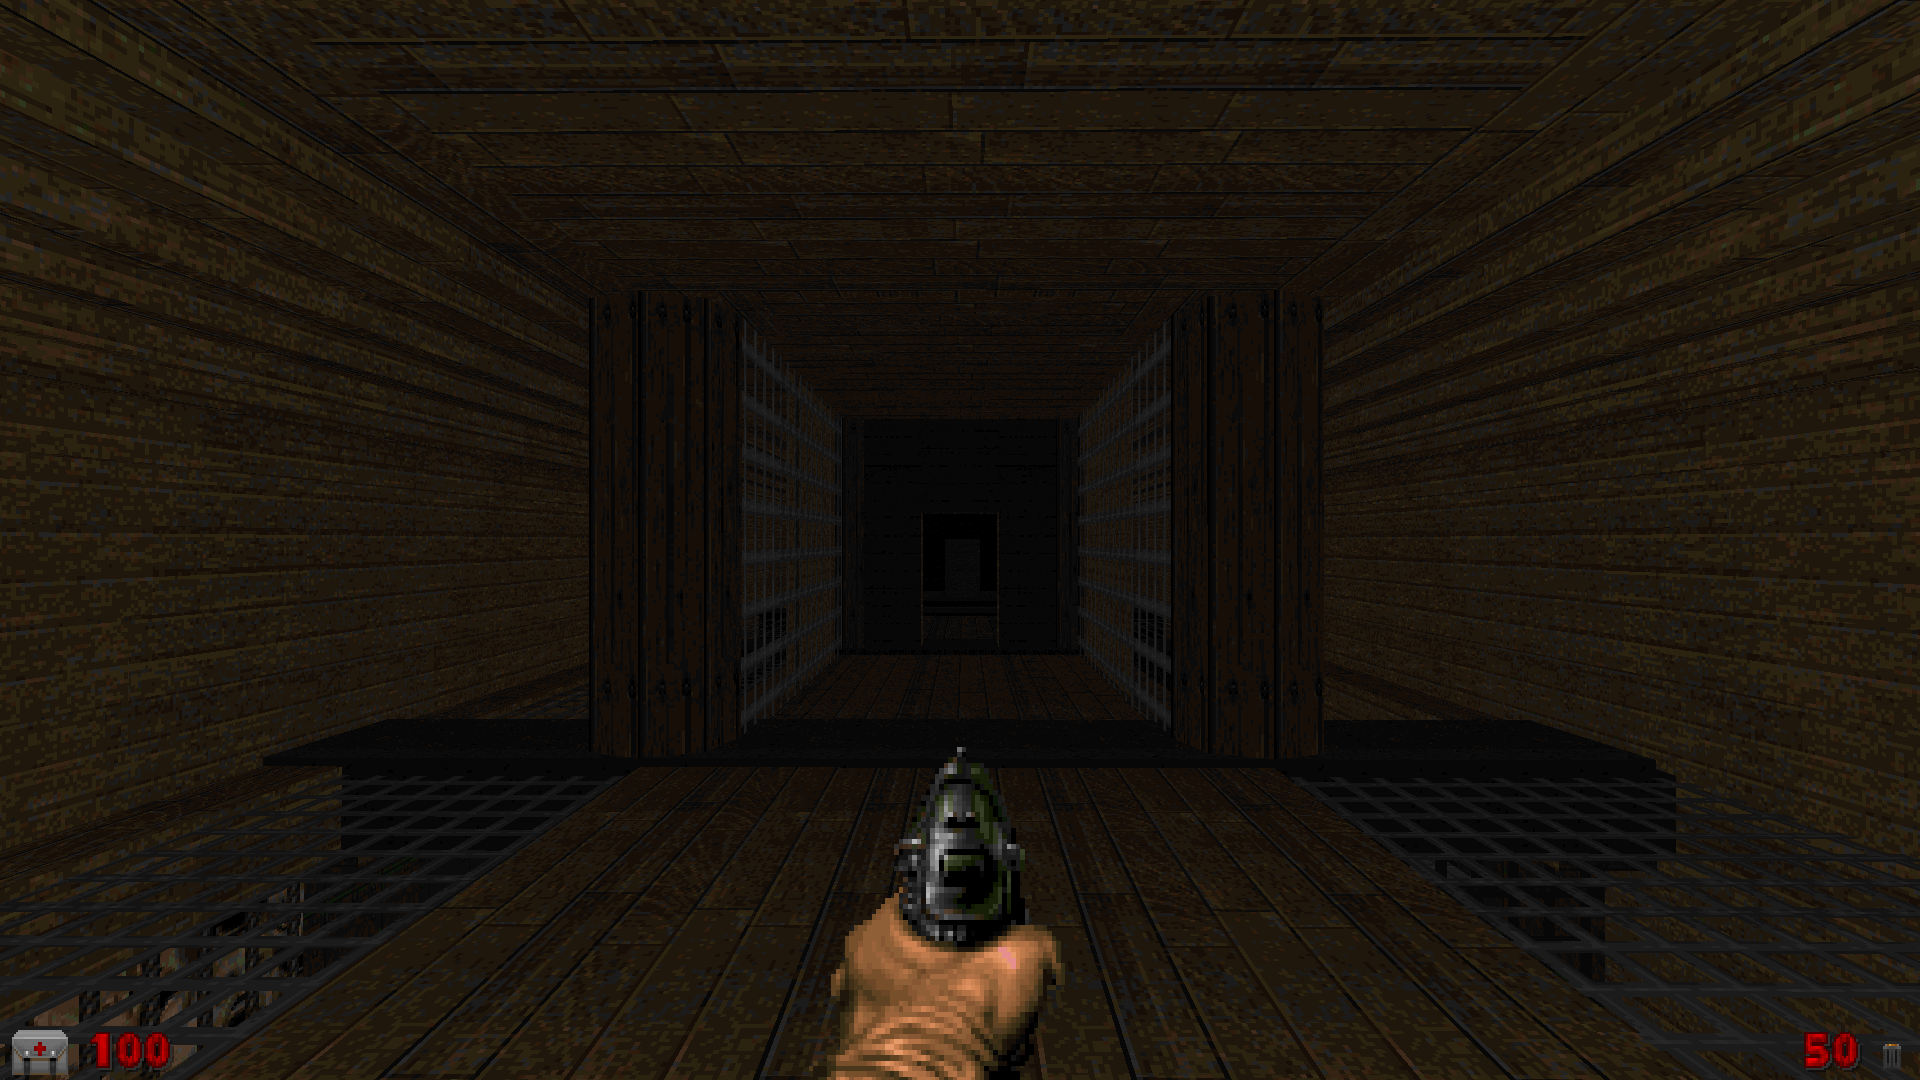 Screenshot_Doom_20200502_163443.png.f3b36d73380be09f9d748fe6f8651e4b.png